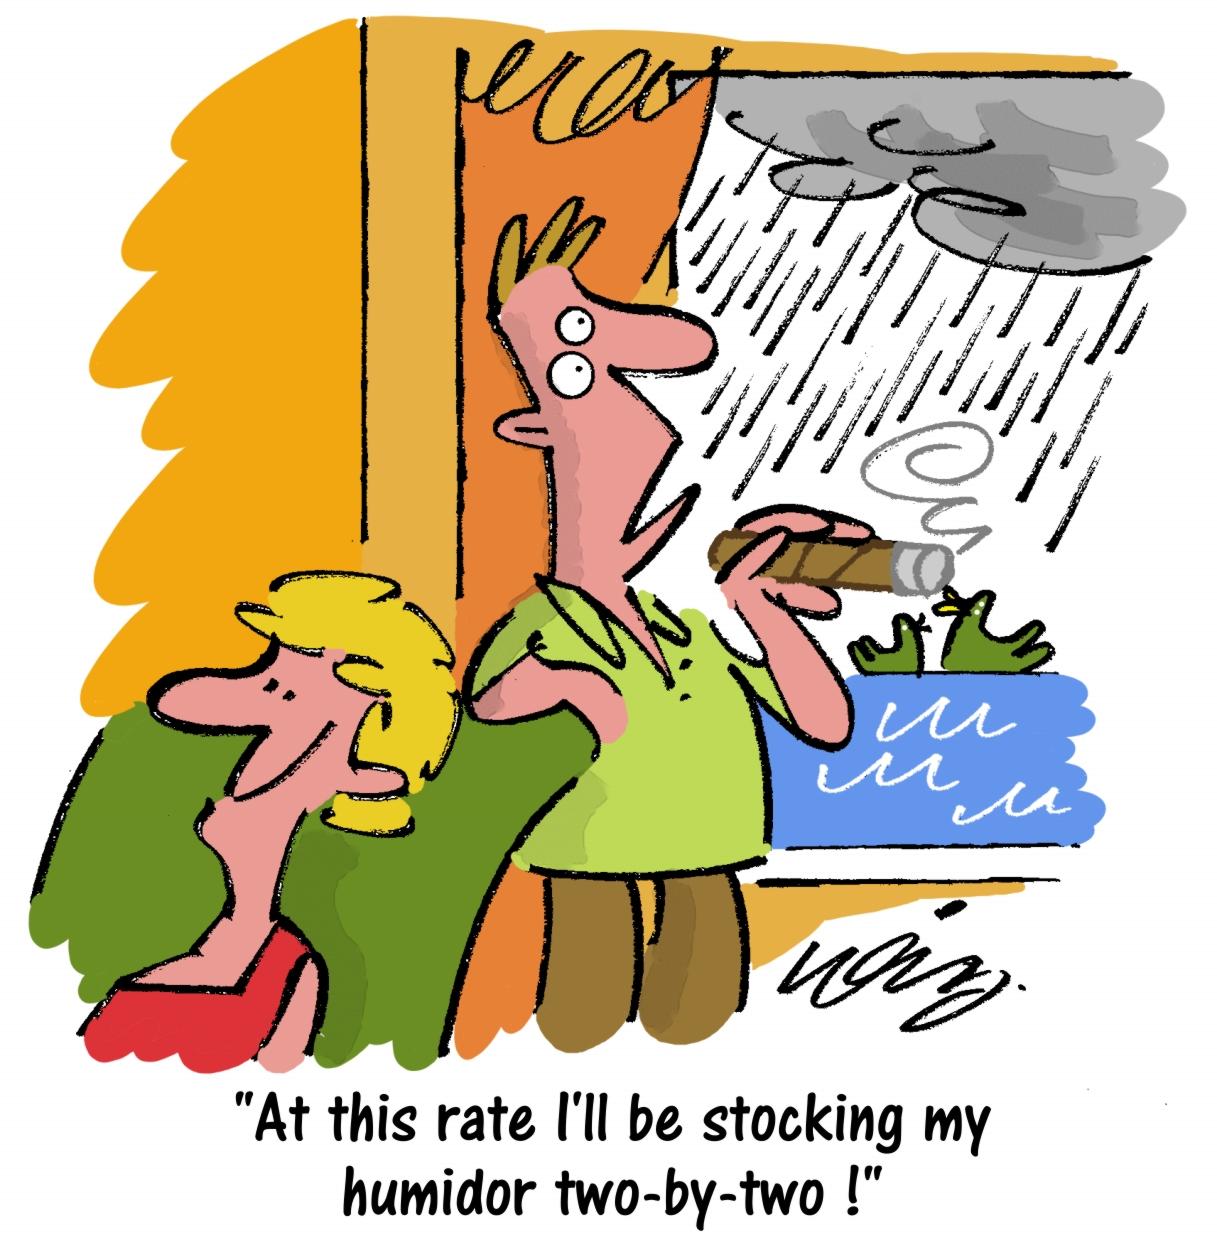 C.Gars Rain Weather Cigar Cartoon